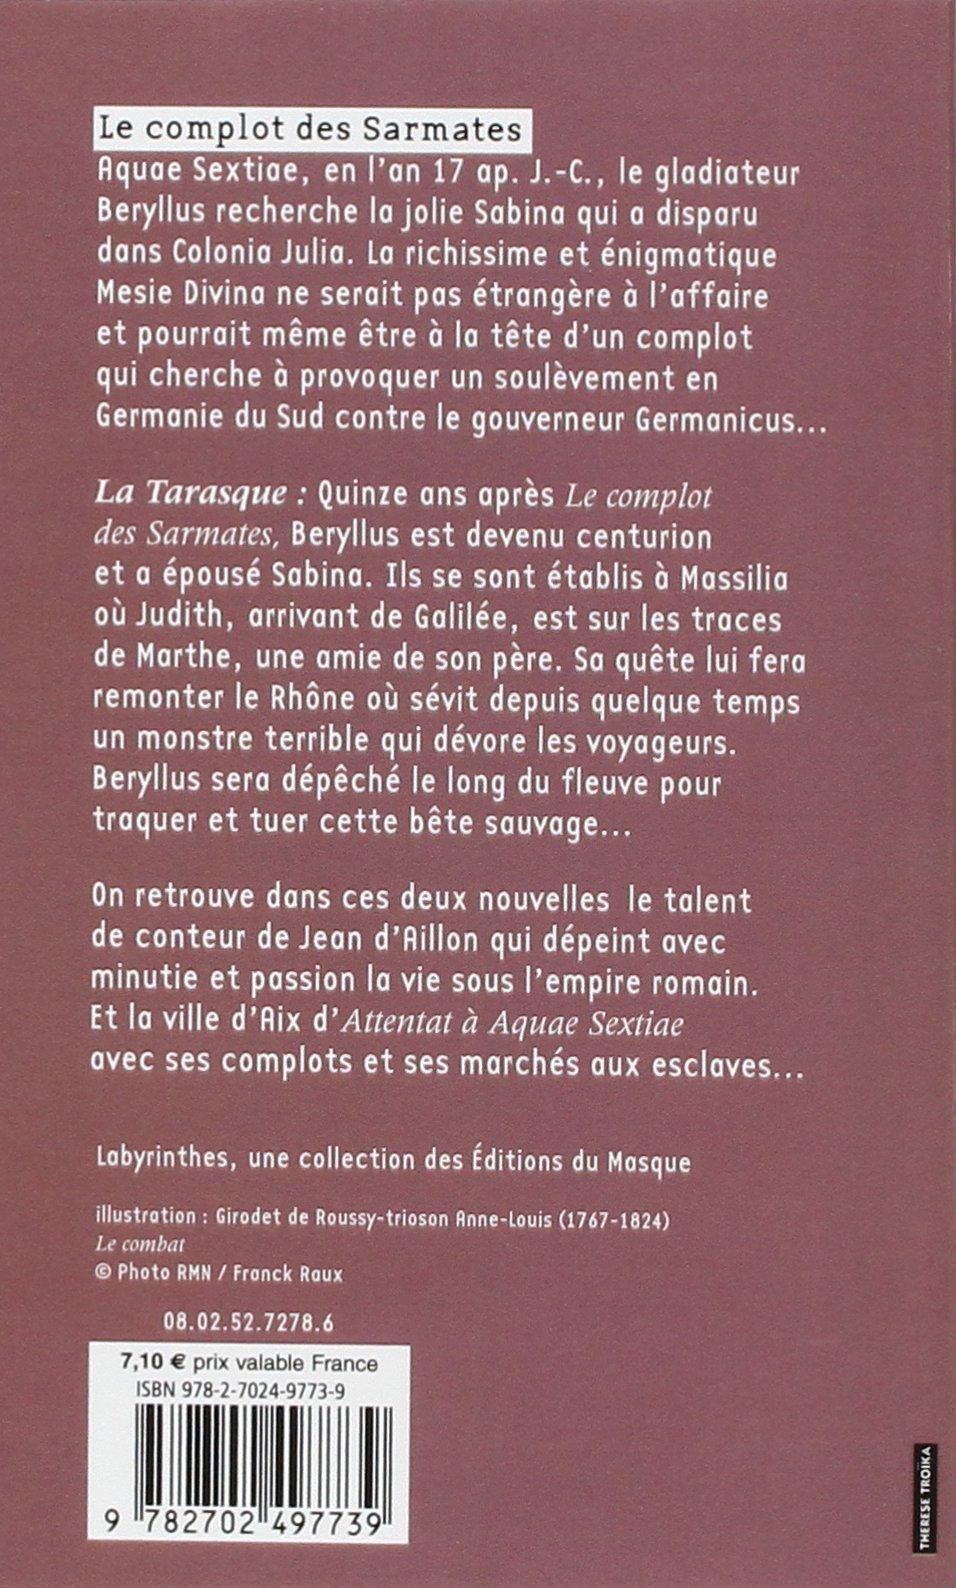 Le complot des Sarmates : Suivi de La Tarasque Labyrinthes: Amazon.es: Jean d Aillon: Libros en idiomas extranjeros